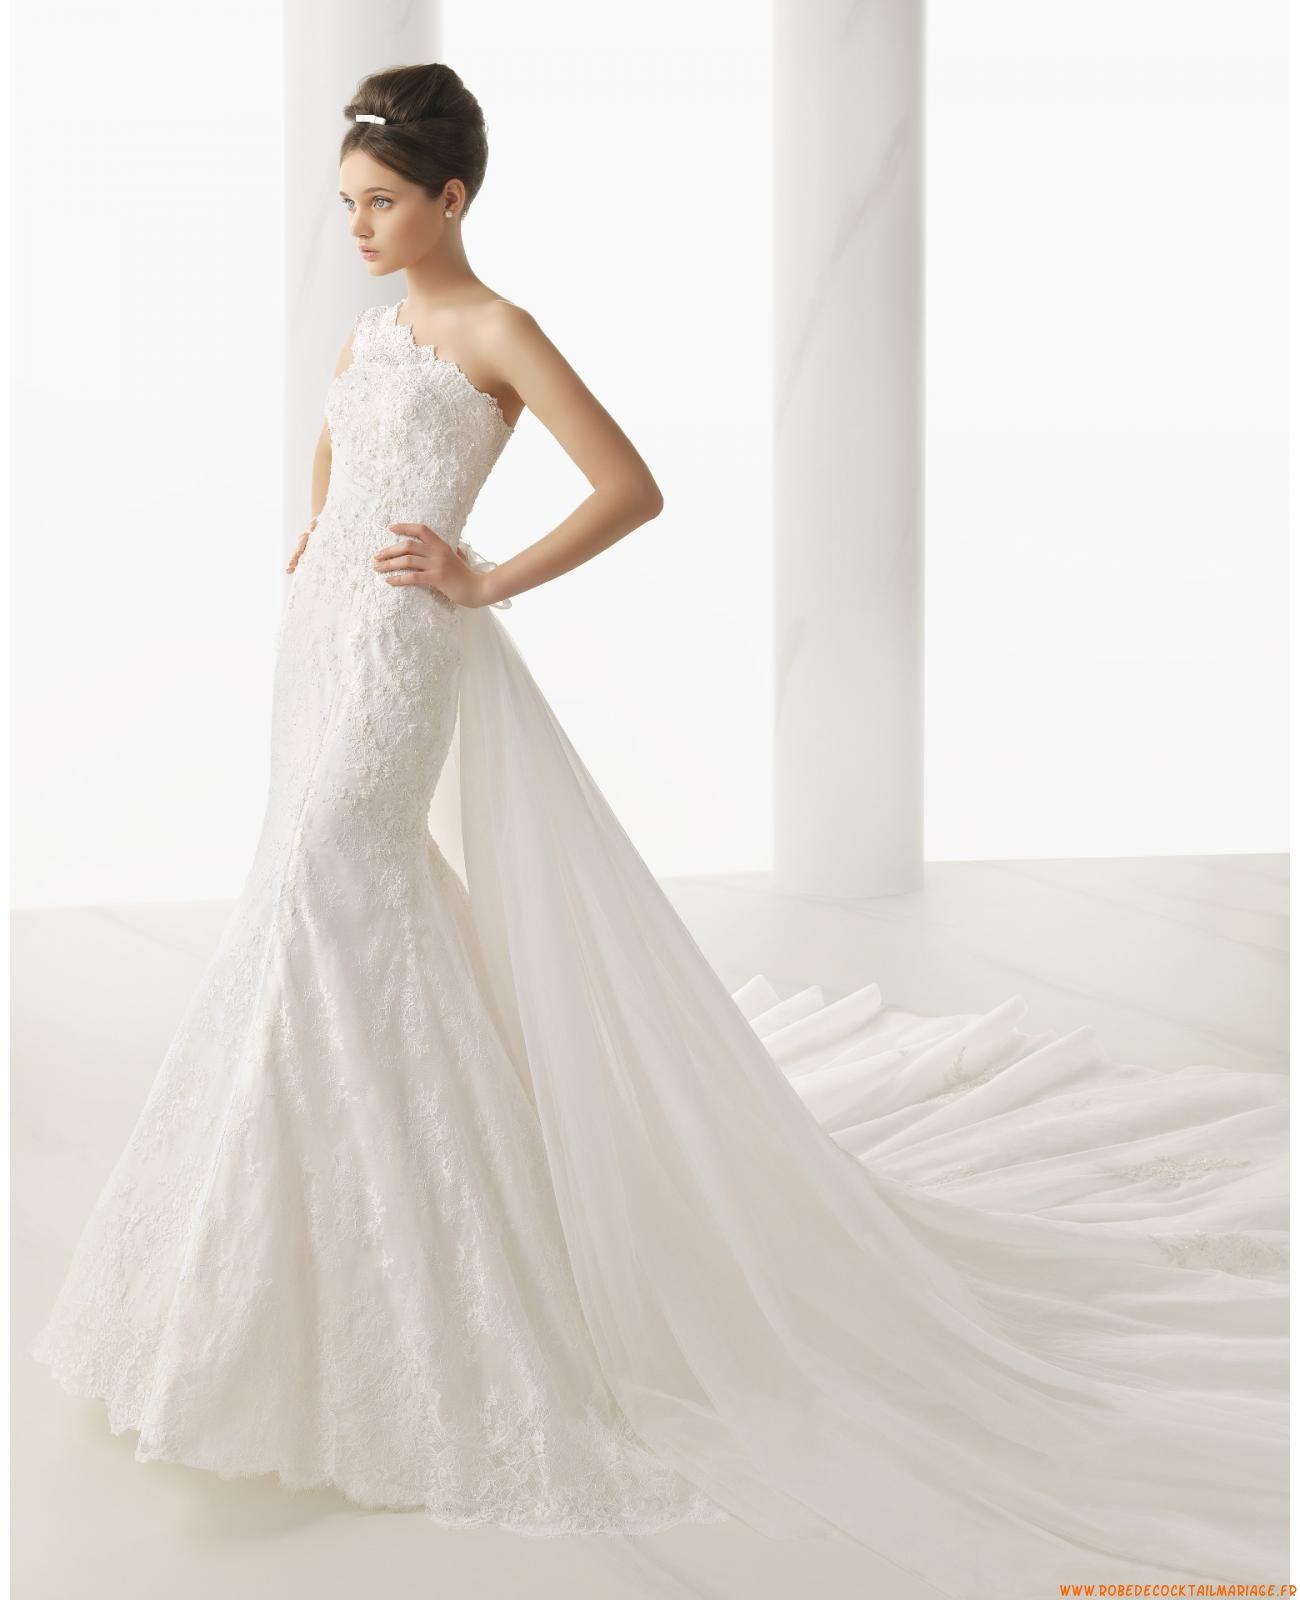 Robe de mariée sirène dentelle application avec traine amovible http://www.robedecocktailma ...